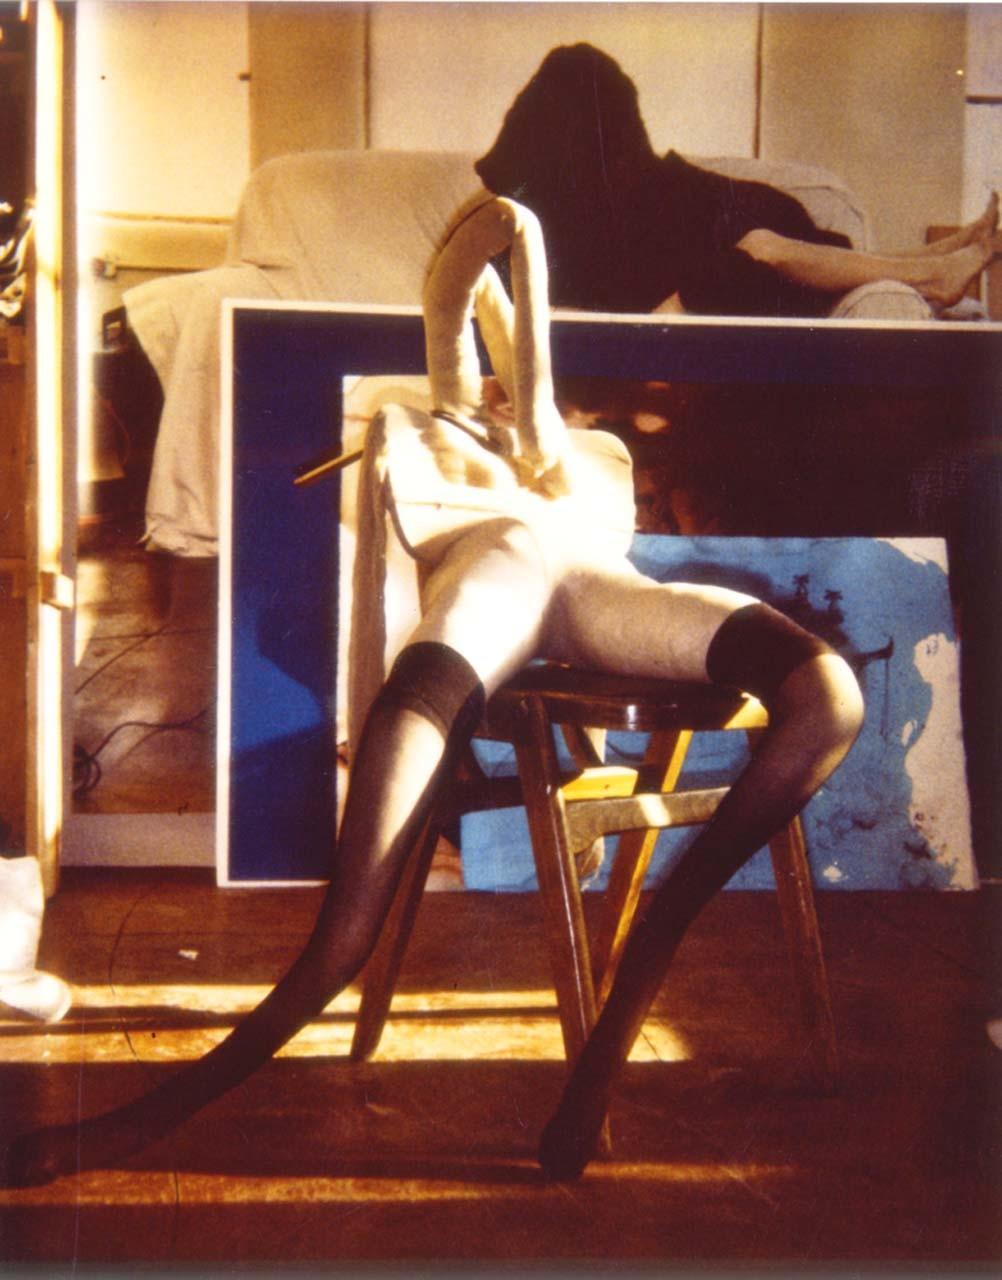 <p>Polaroid Bunny #2, 1997</p>